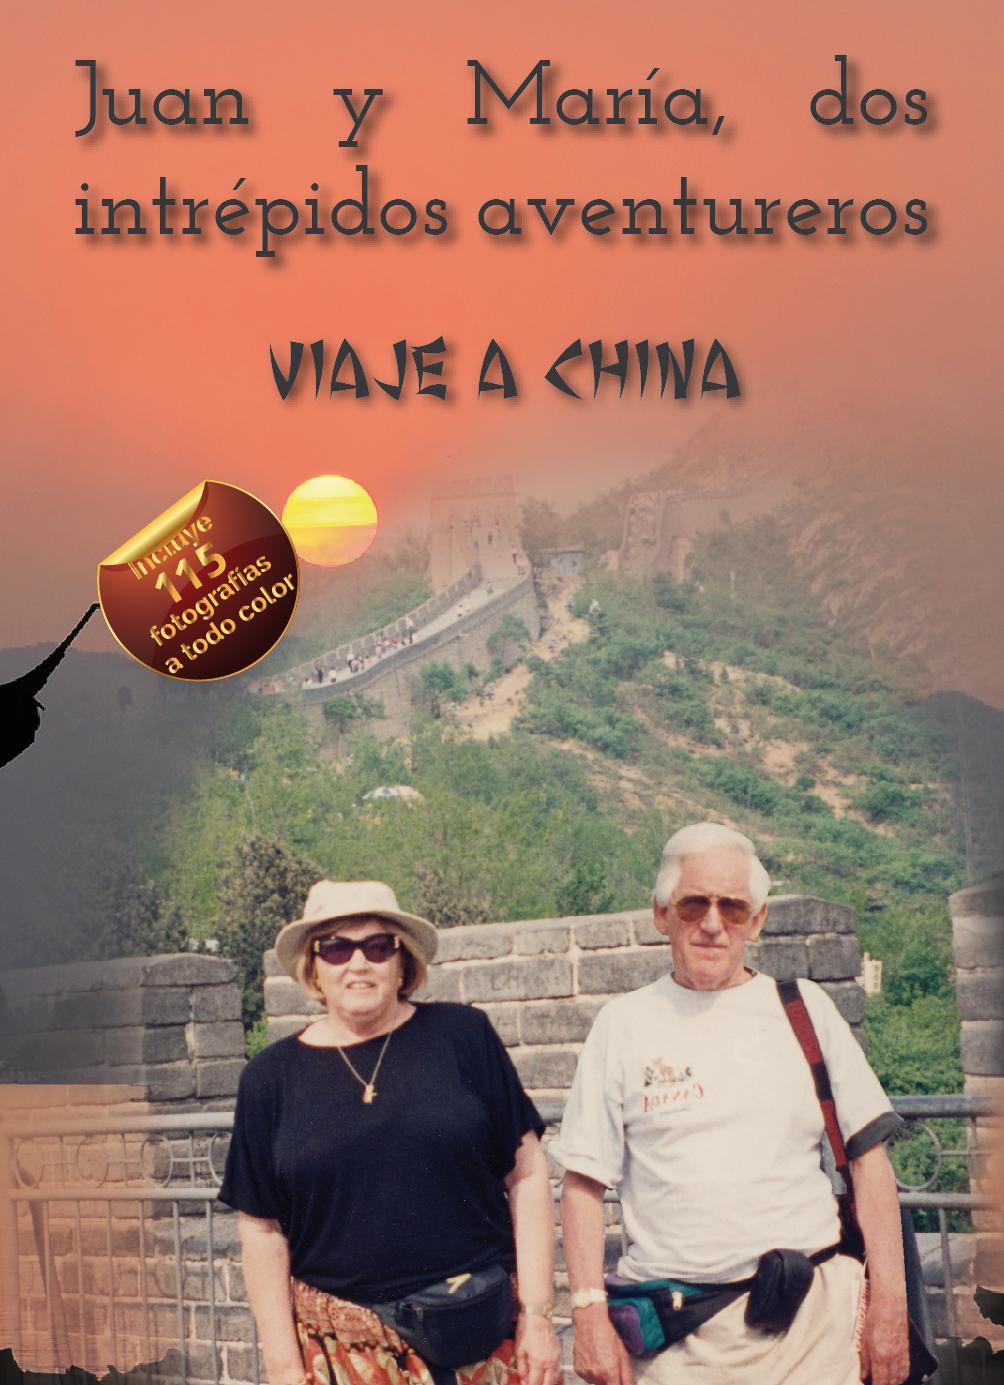 JUAN Y MARIA DOS INTREPIDOS AVENTUREROS - VIAJE A CHINA